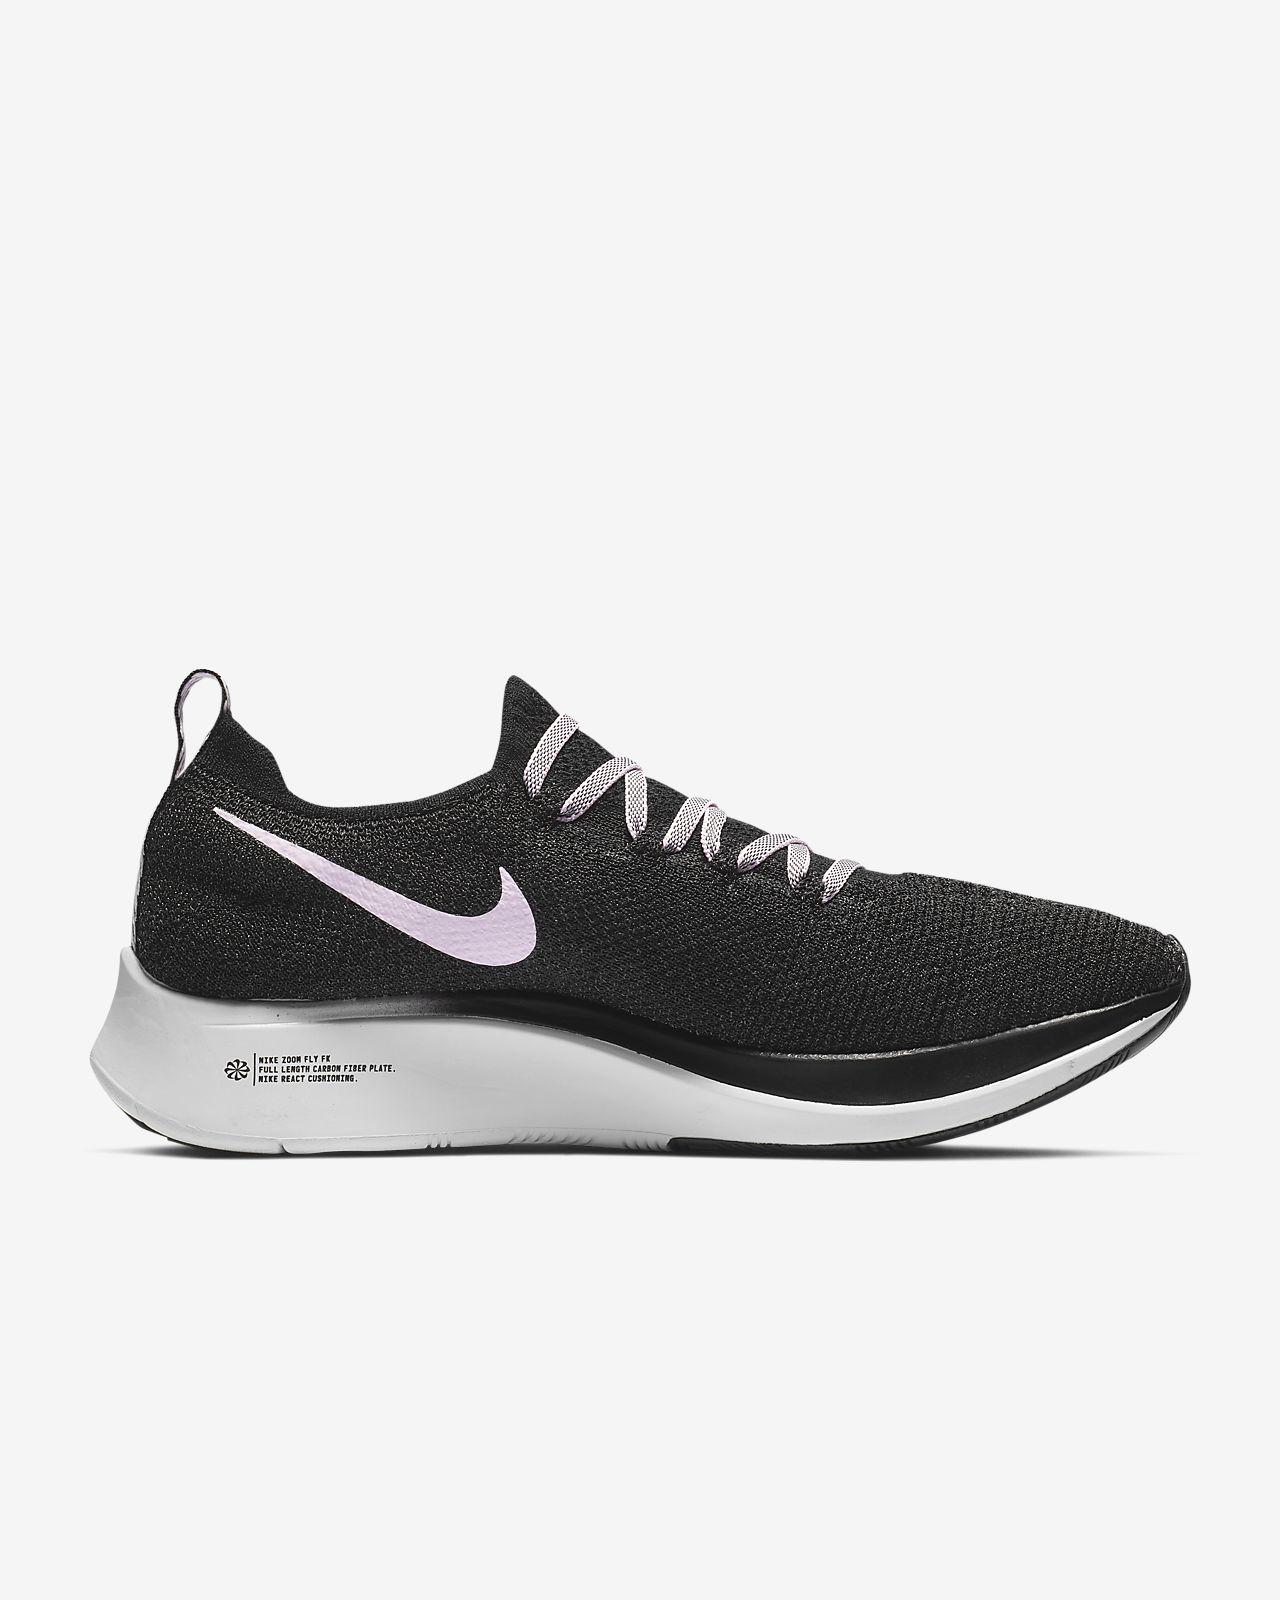 online retailer 1f5d1 3c865 ... Chaussure de running Nike Zoom Fly Flyknit pour Femme